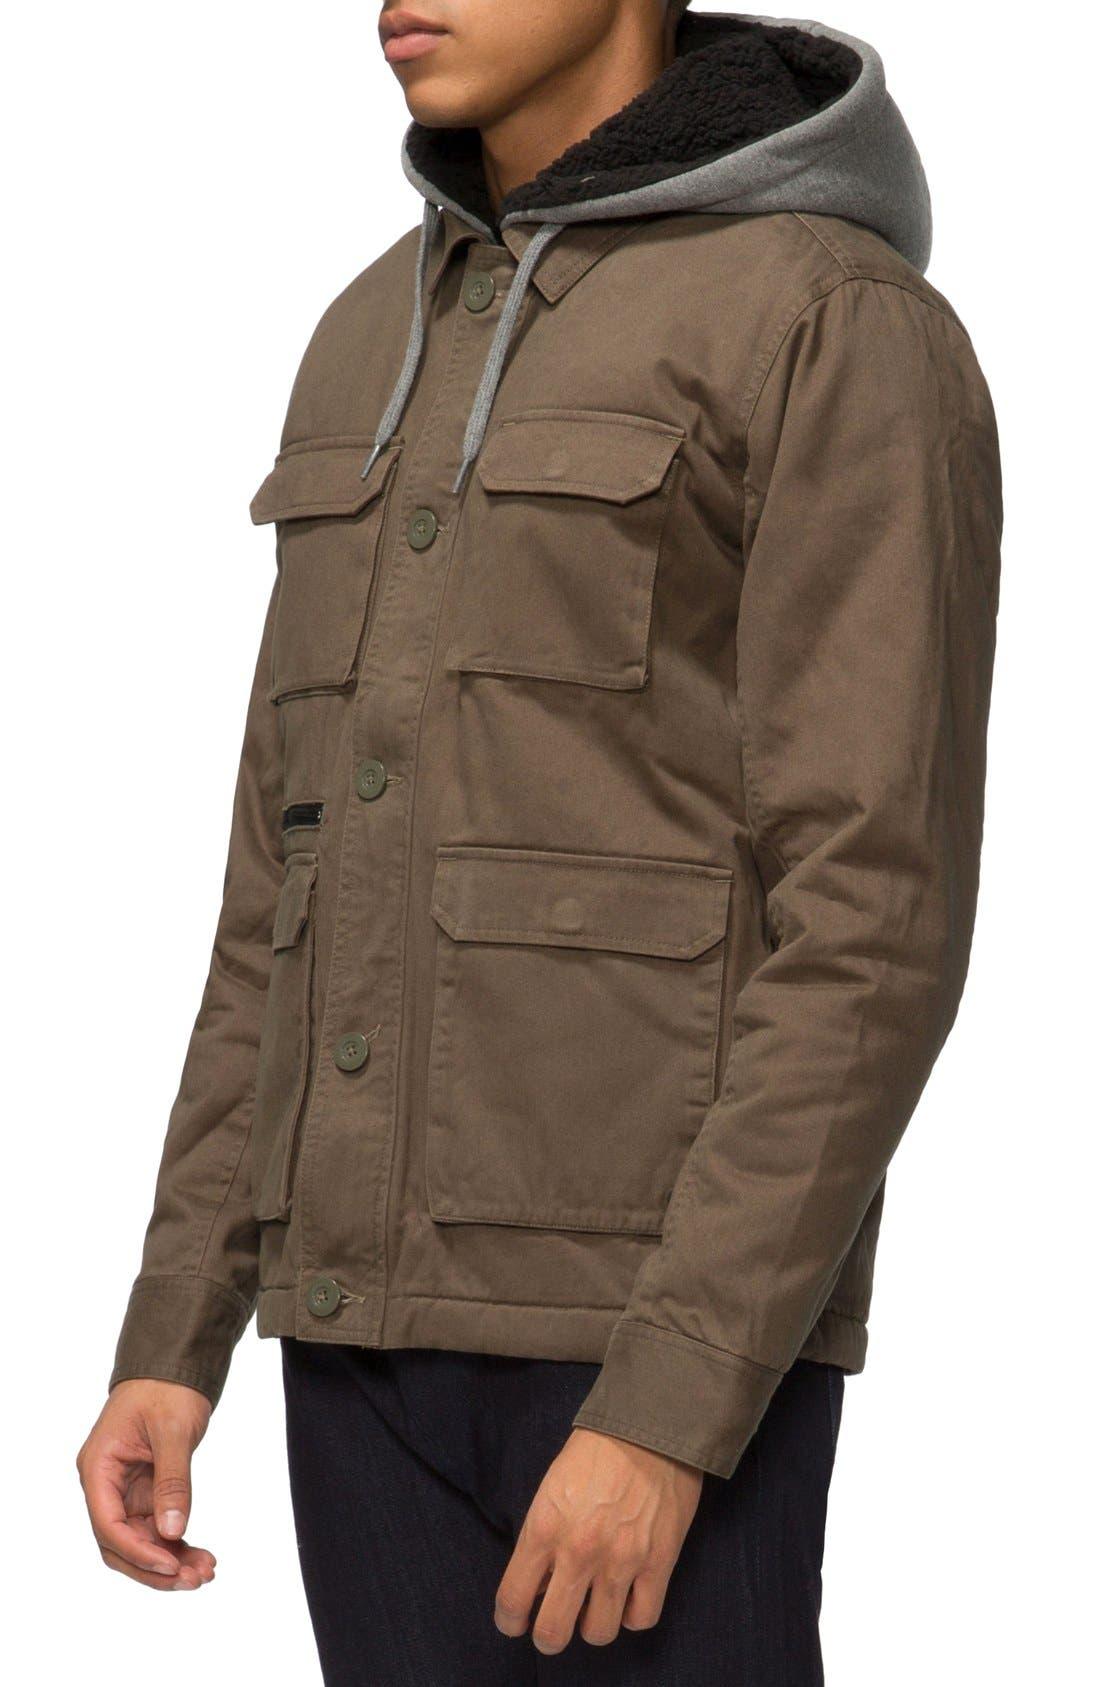 Droogs Plus Field Jacket with Detachable Hood,                             Alternate thumbnail 6, color,                             304